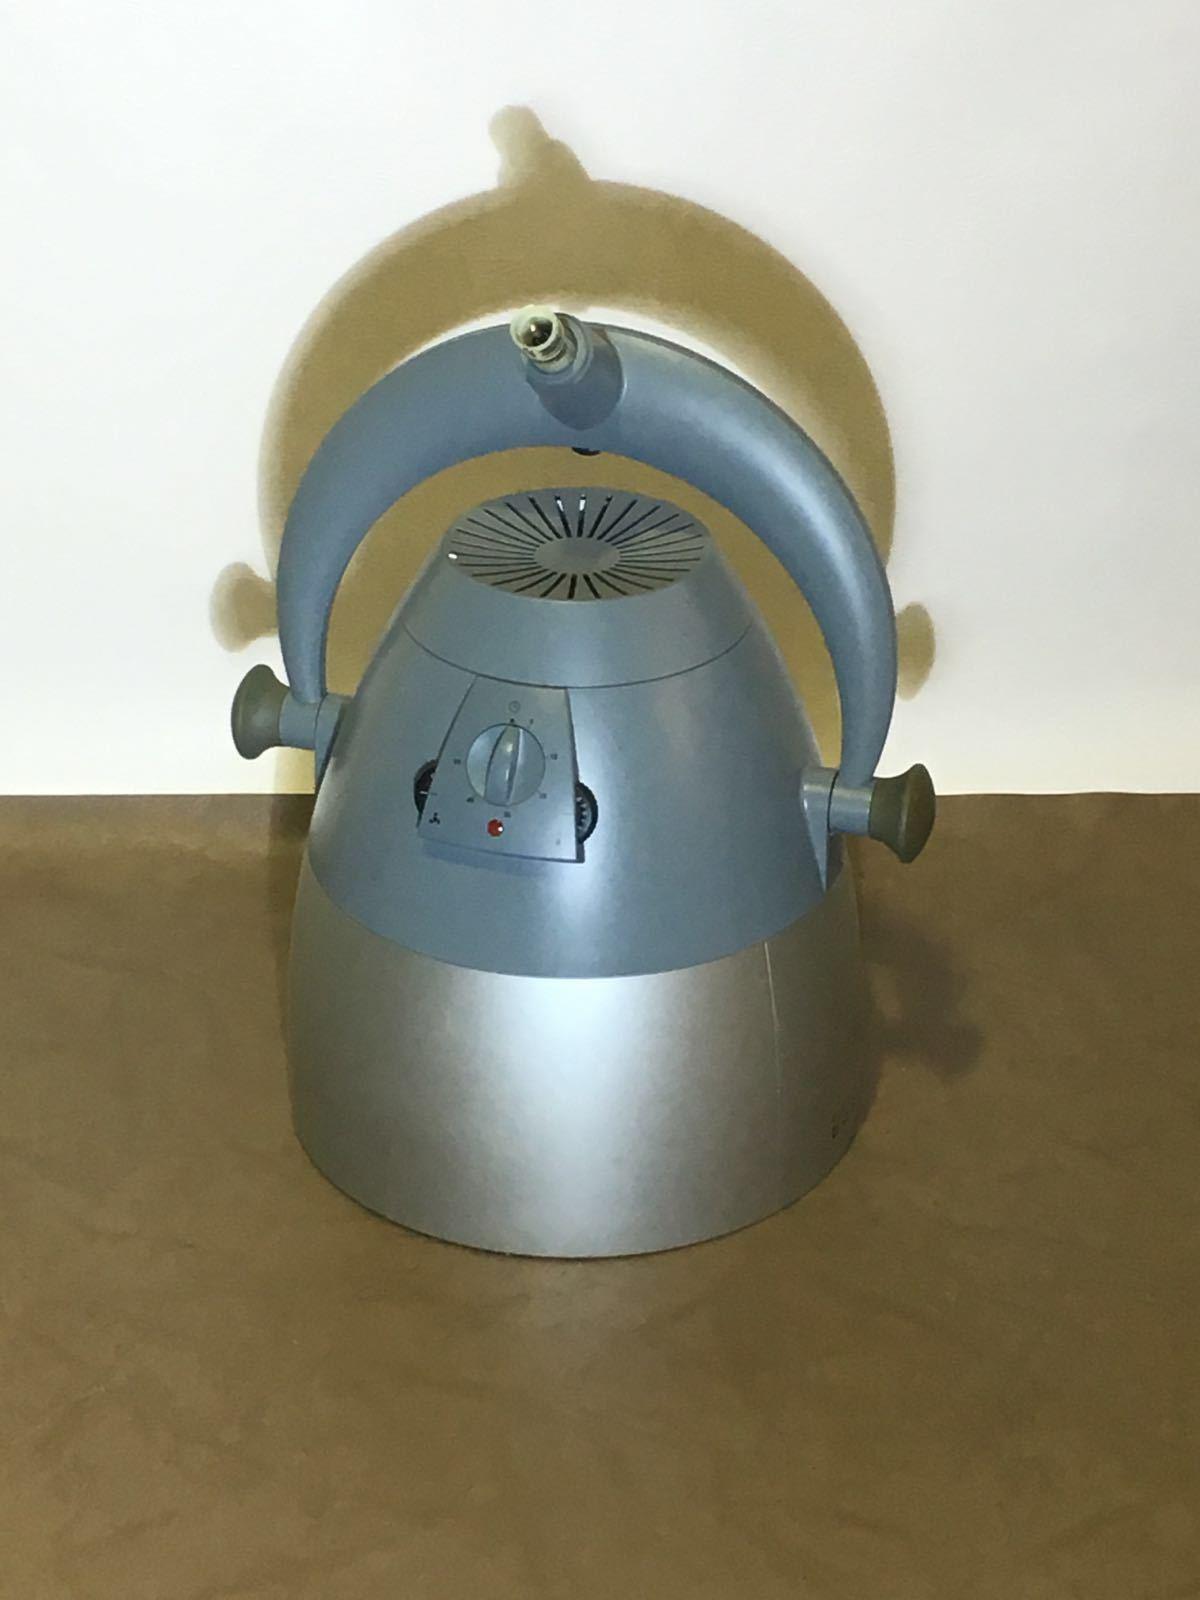 Wella Basic Trockenhaube (Grau) Image